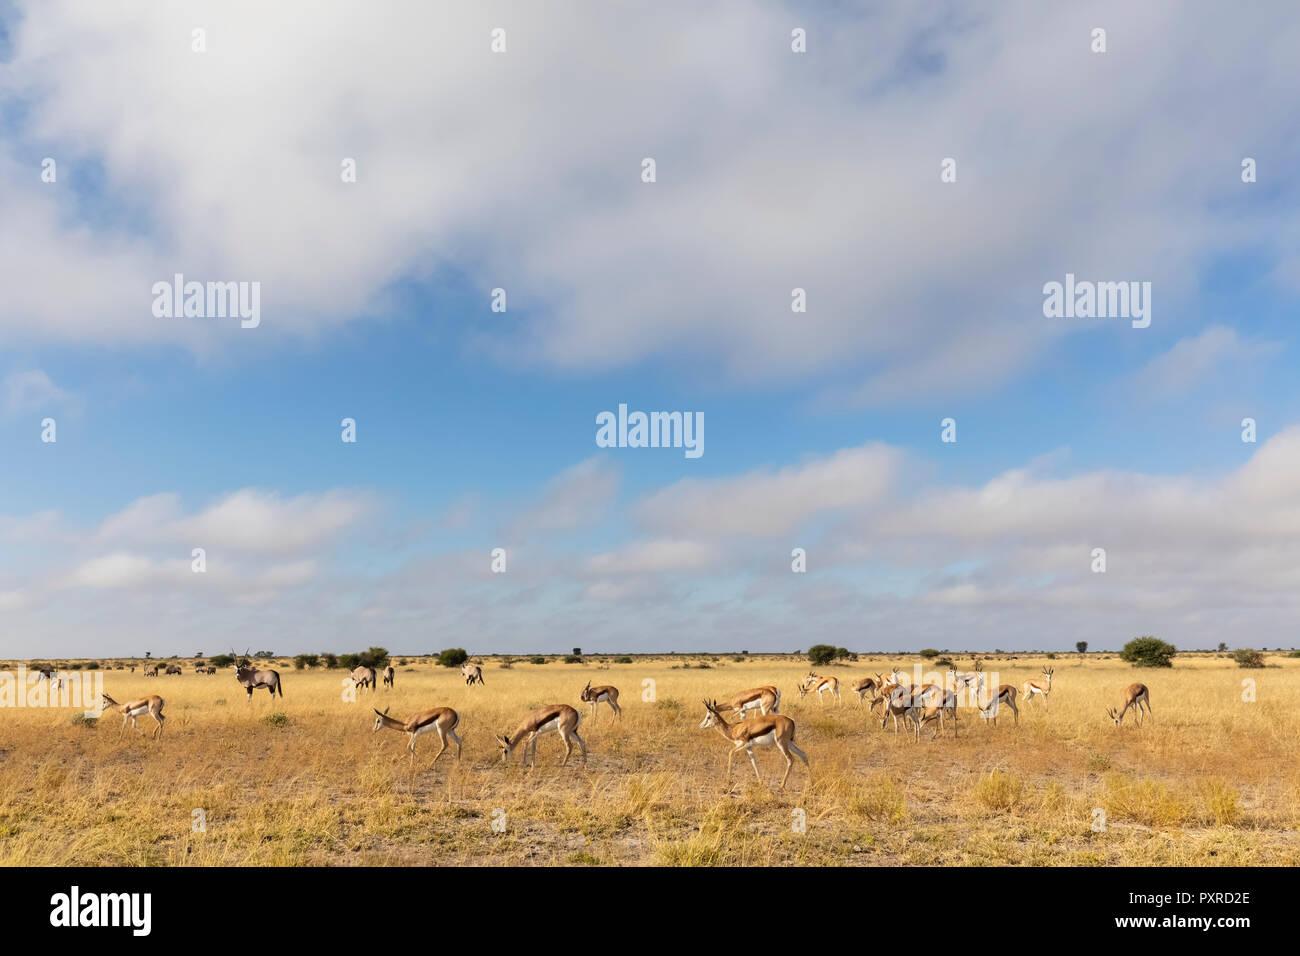 Botswana, Kalahari, Central Kalahari Game Reserve, Gemsboks, Oryx gazella - Stock Image